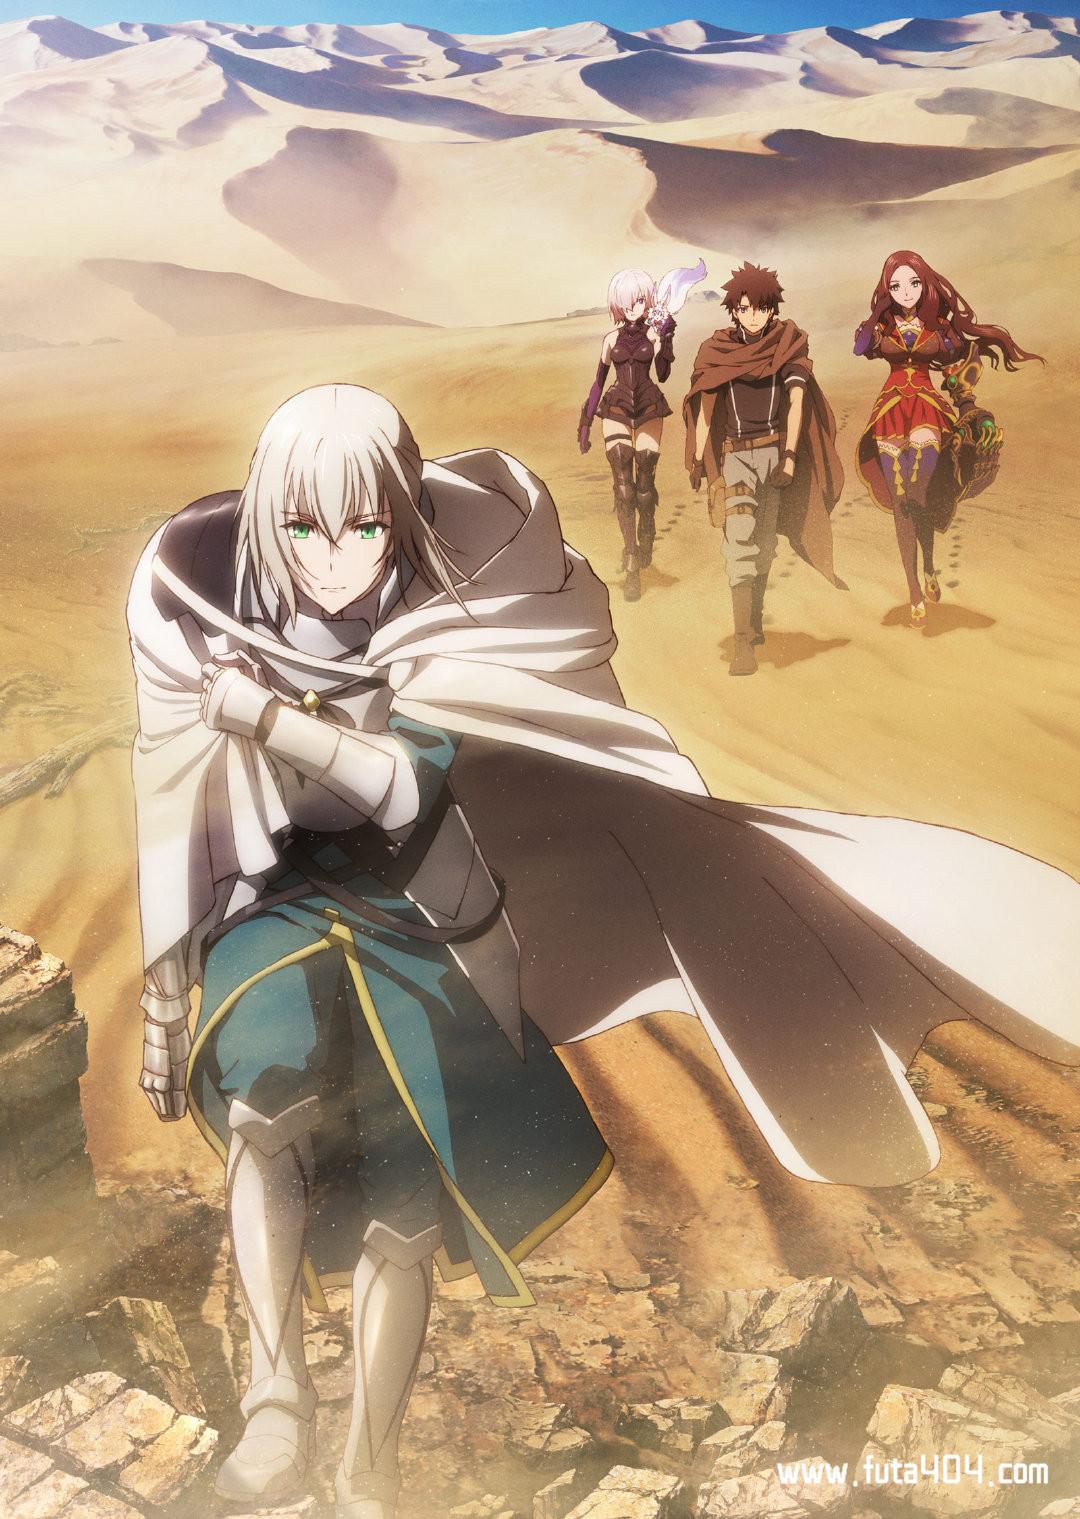 Fate Grand Order 神圣圆桌领域卡美洛 第1弹特报公开! Fate Grand Order ACG资讯